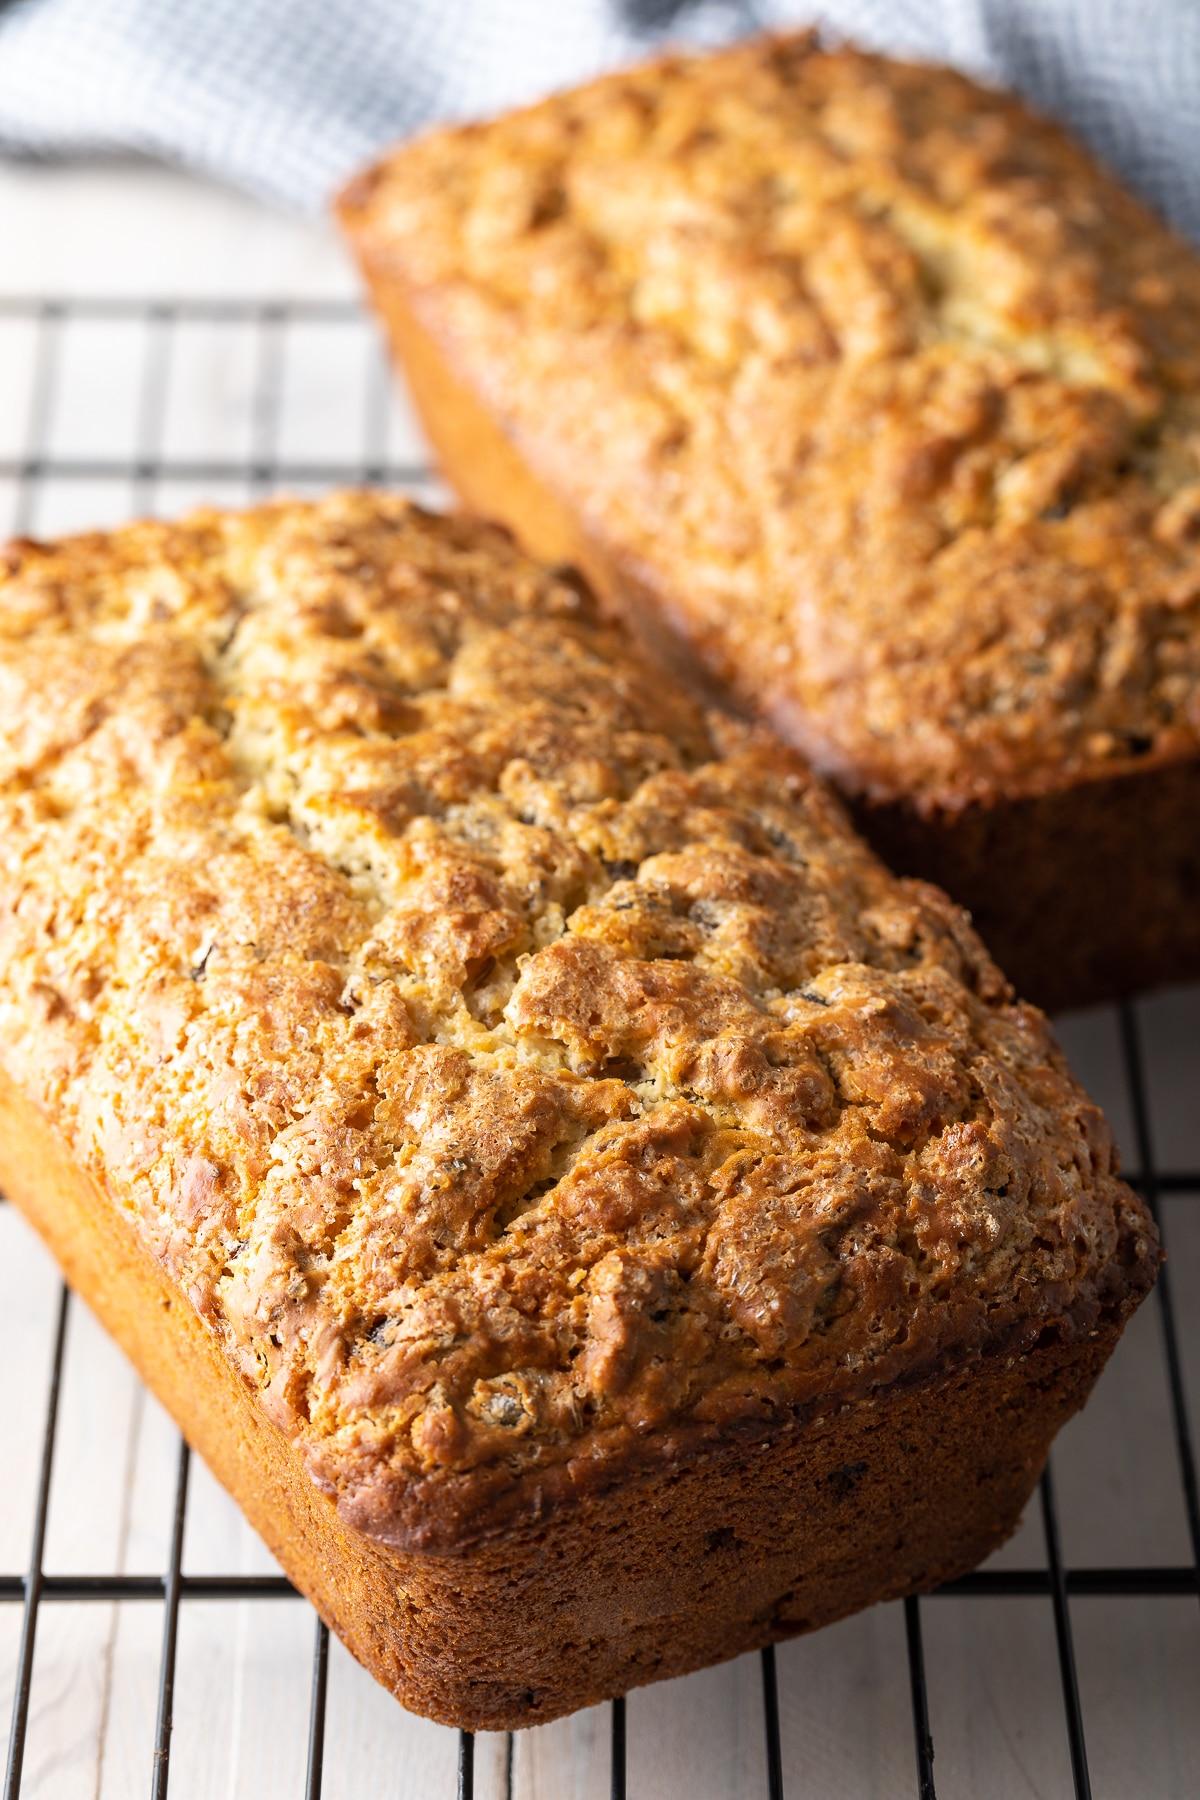 Easy Irish Soda Bread Recipe #ASpicyPerspective #march #saintpatricksday #stpatricksday #stpaddysday #bread #raisins #irish